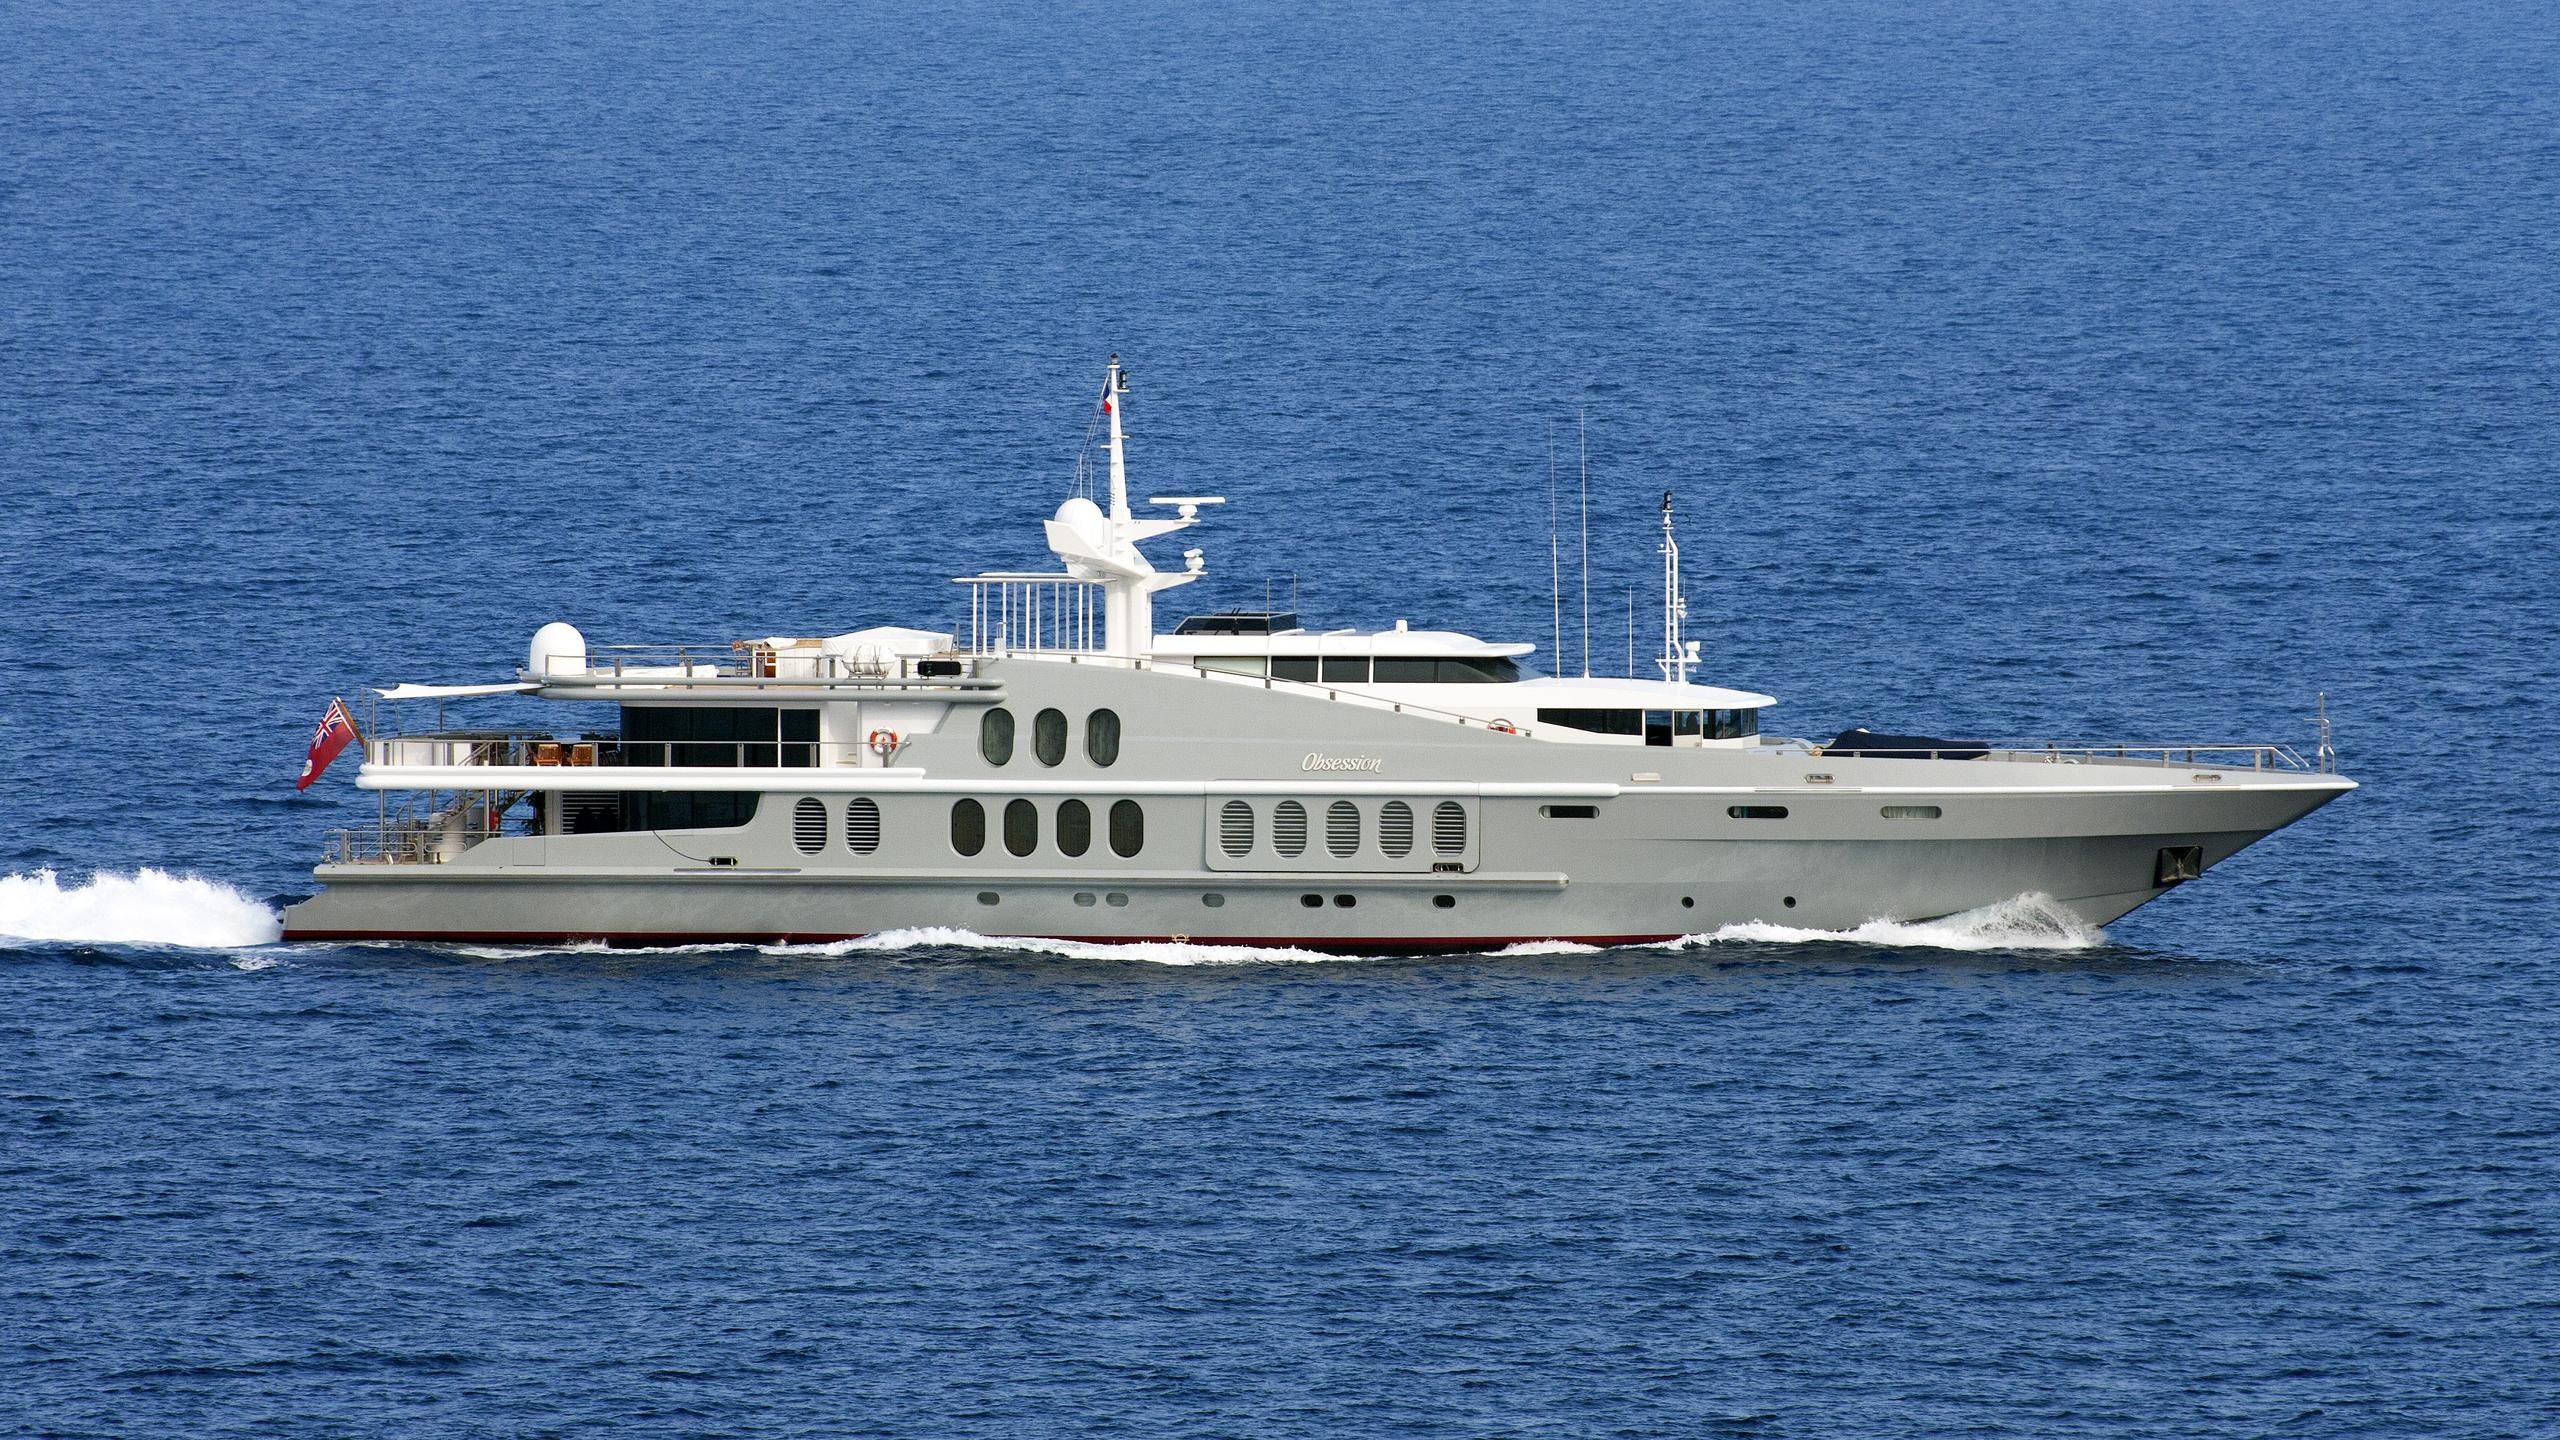 oceana-motor-yacht-oceanfast-1991-55m-cruising-before-refit